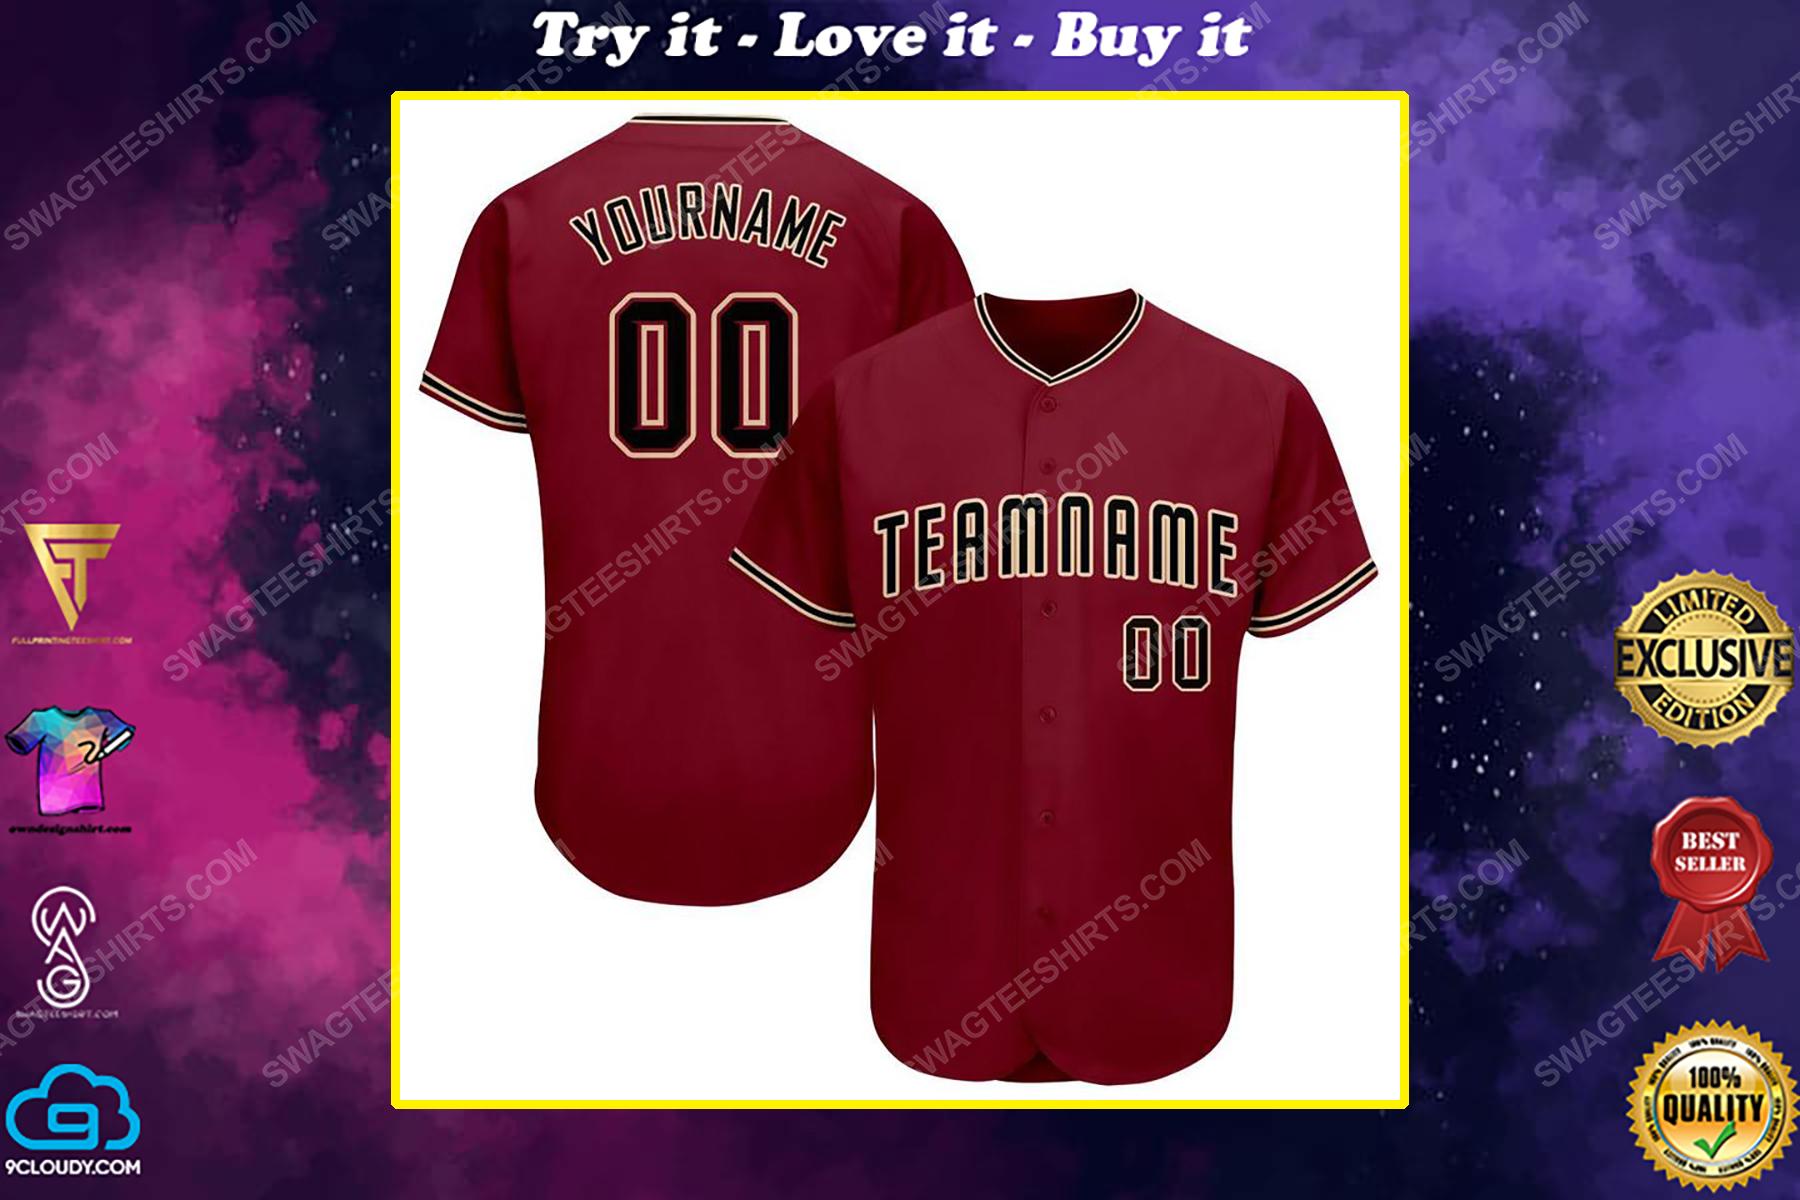 Custom team name arizona diamondbacks full printed baseball jersey